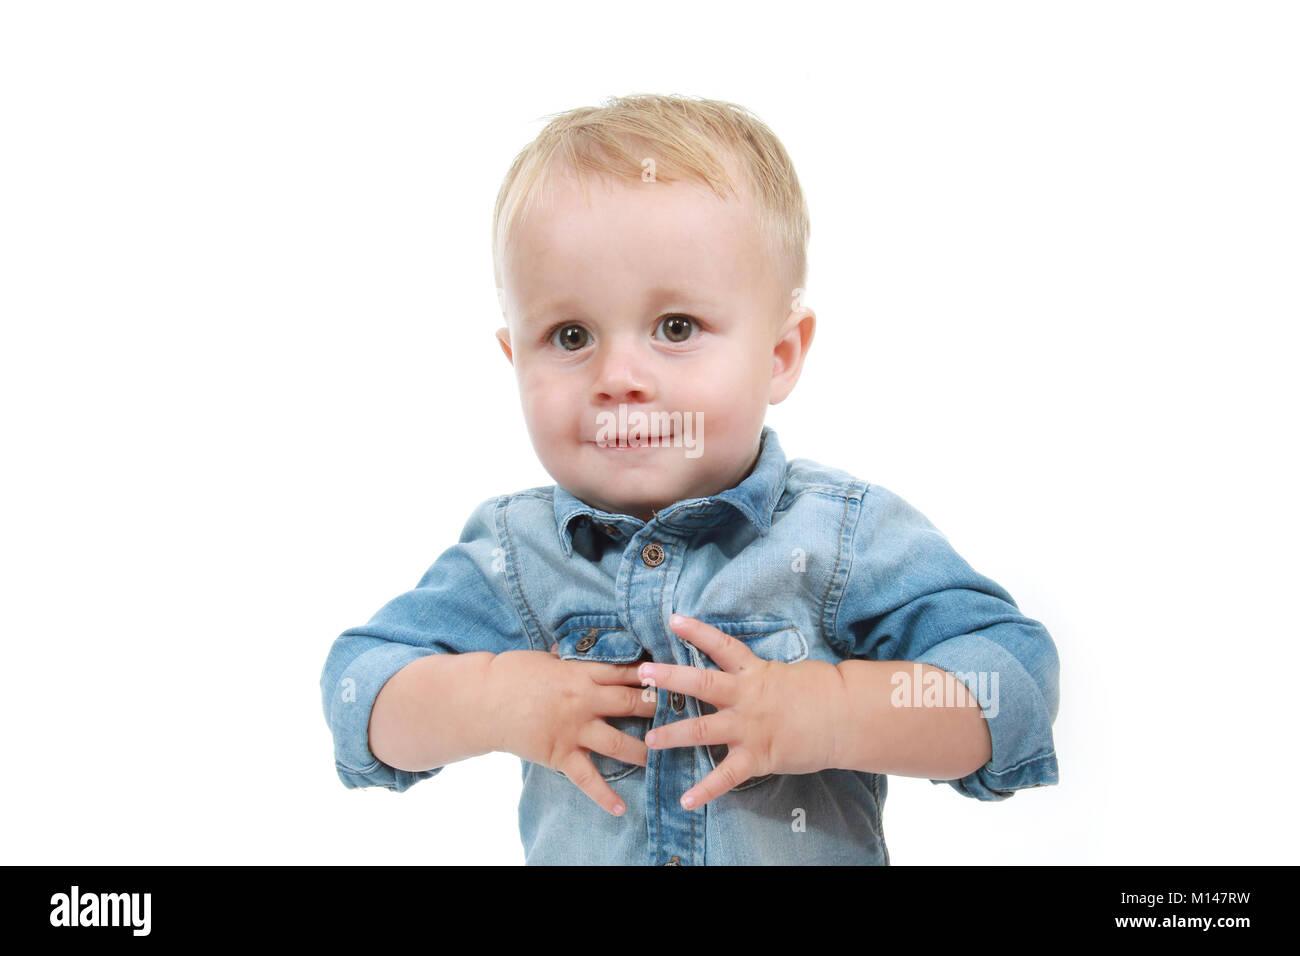 19 Monate Altes Kind